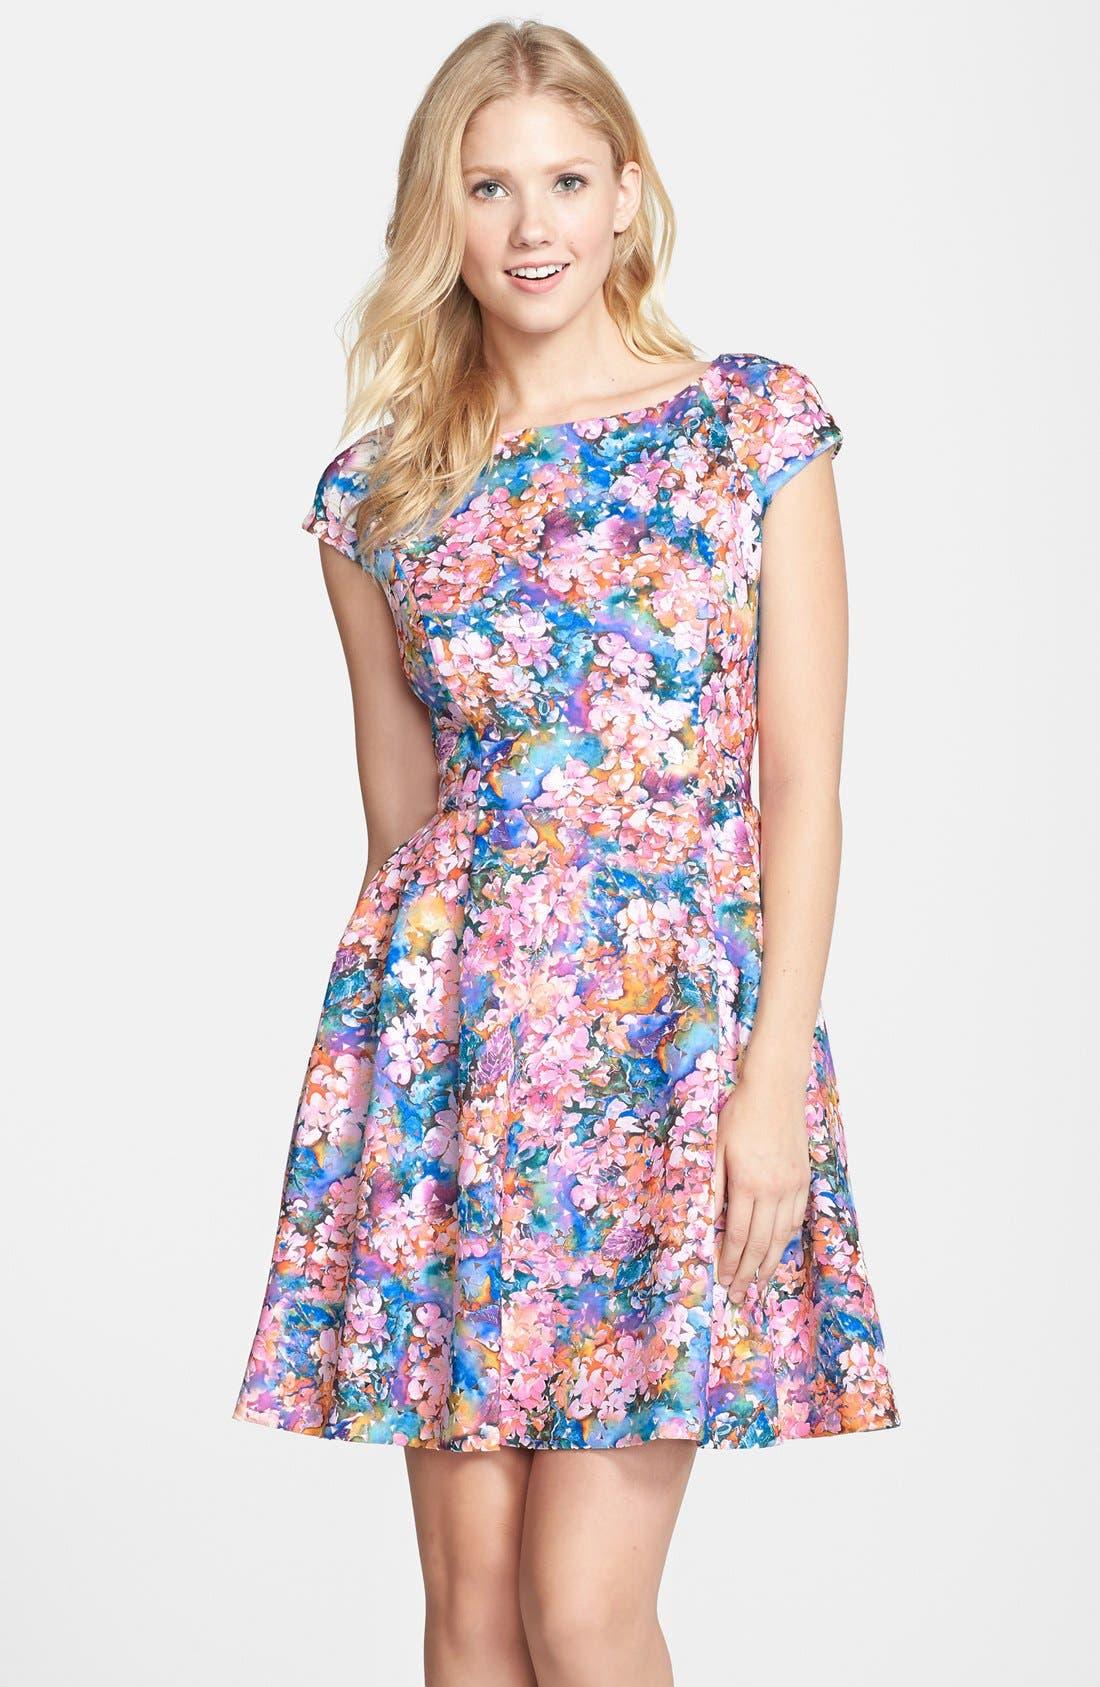 Alternate Image 1 Selected - Betsey Johnson Laser Cut Floral Print Scuba Fit & Flare Dress